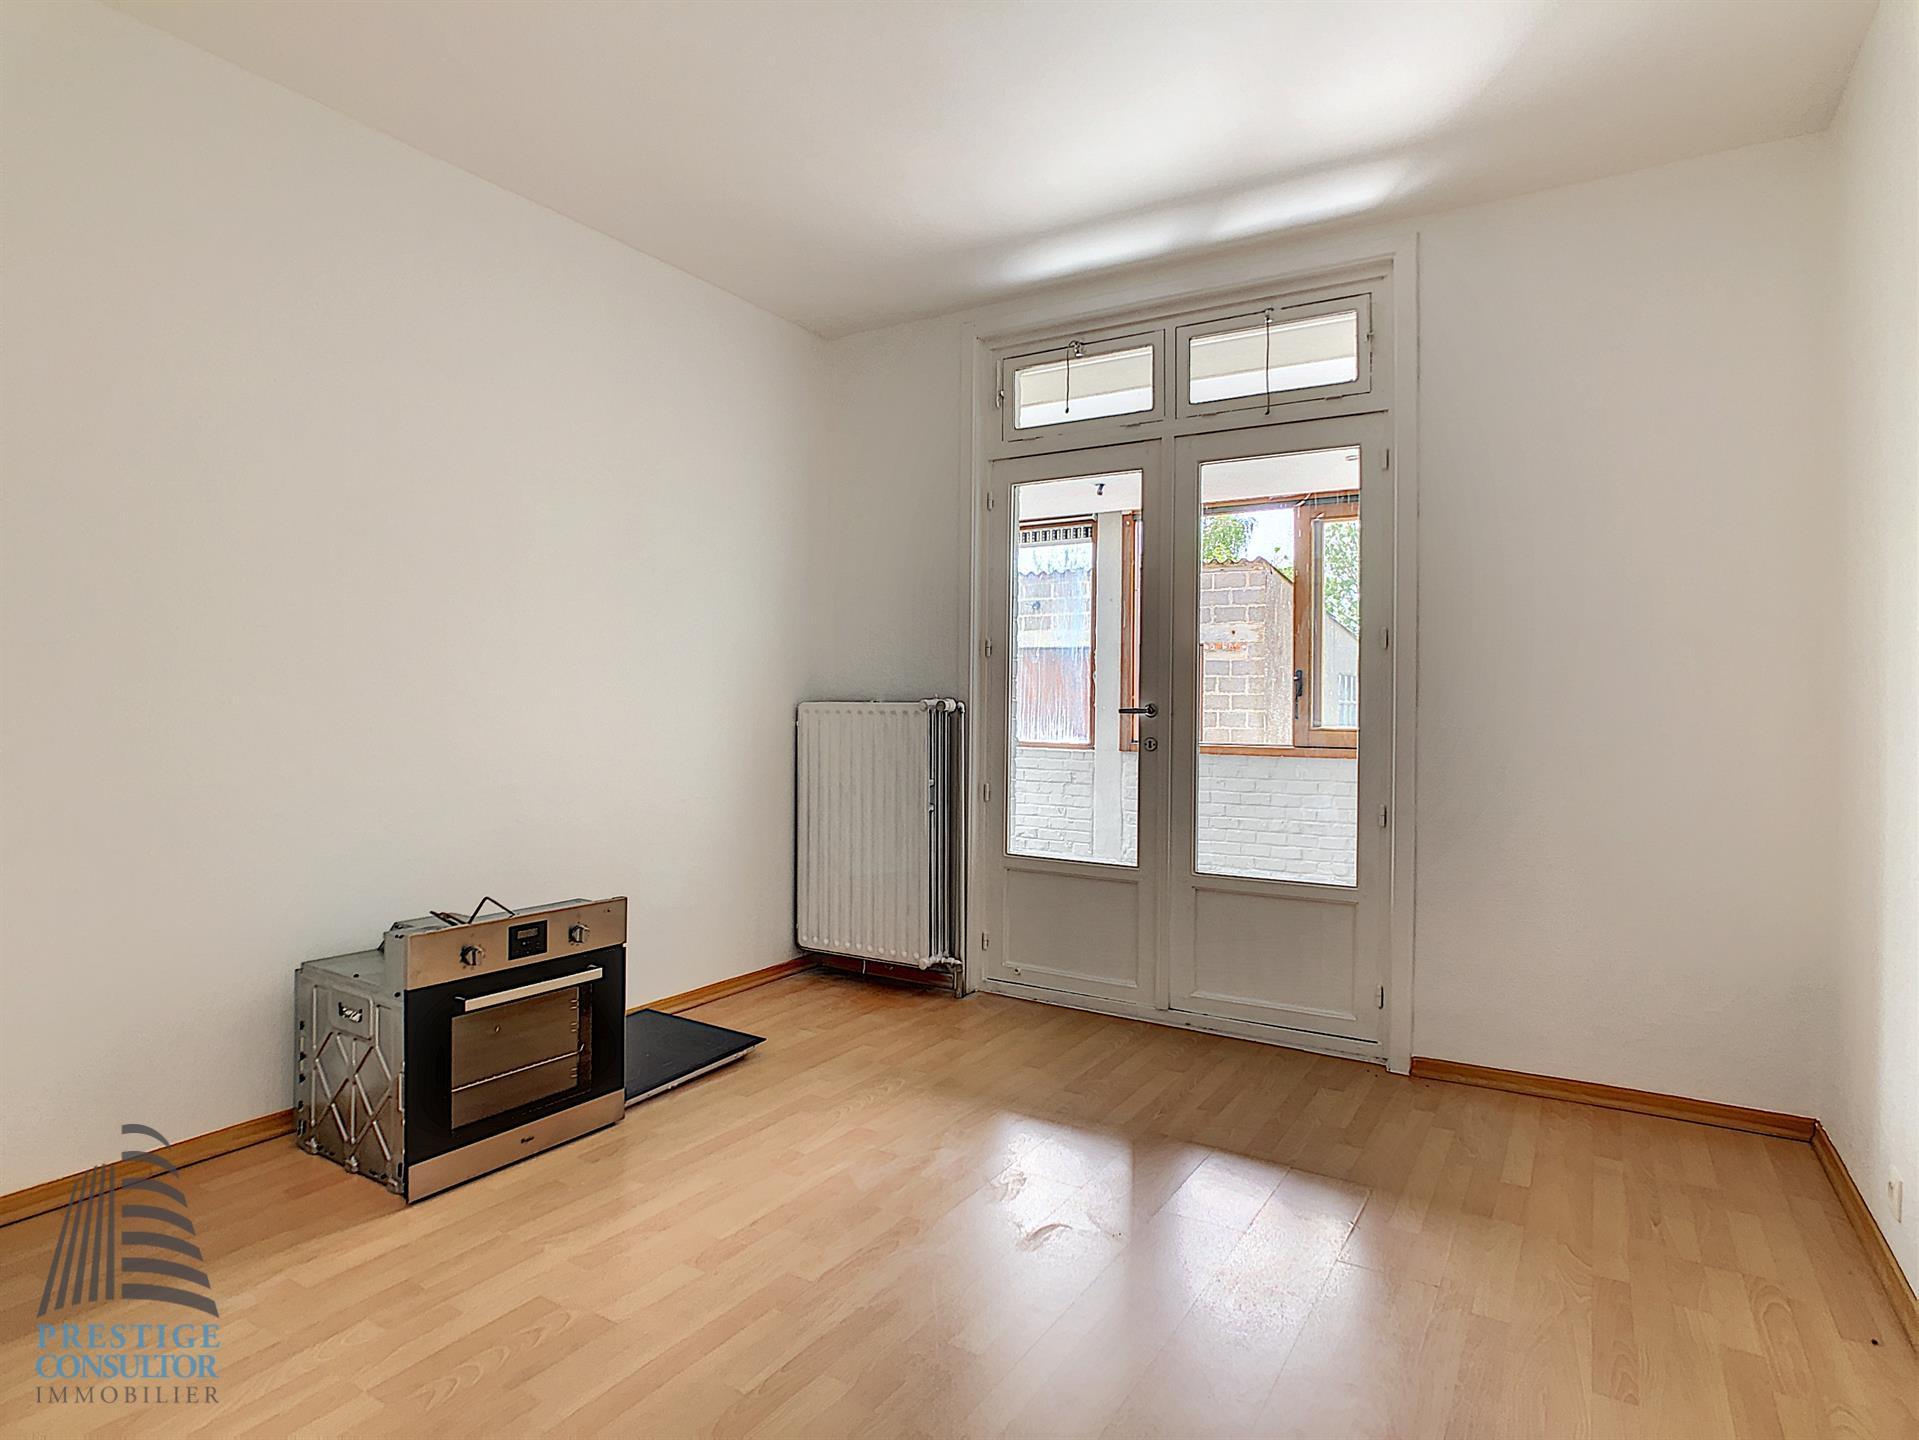 Appartement avec jardin - Halle - #4036235-7